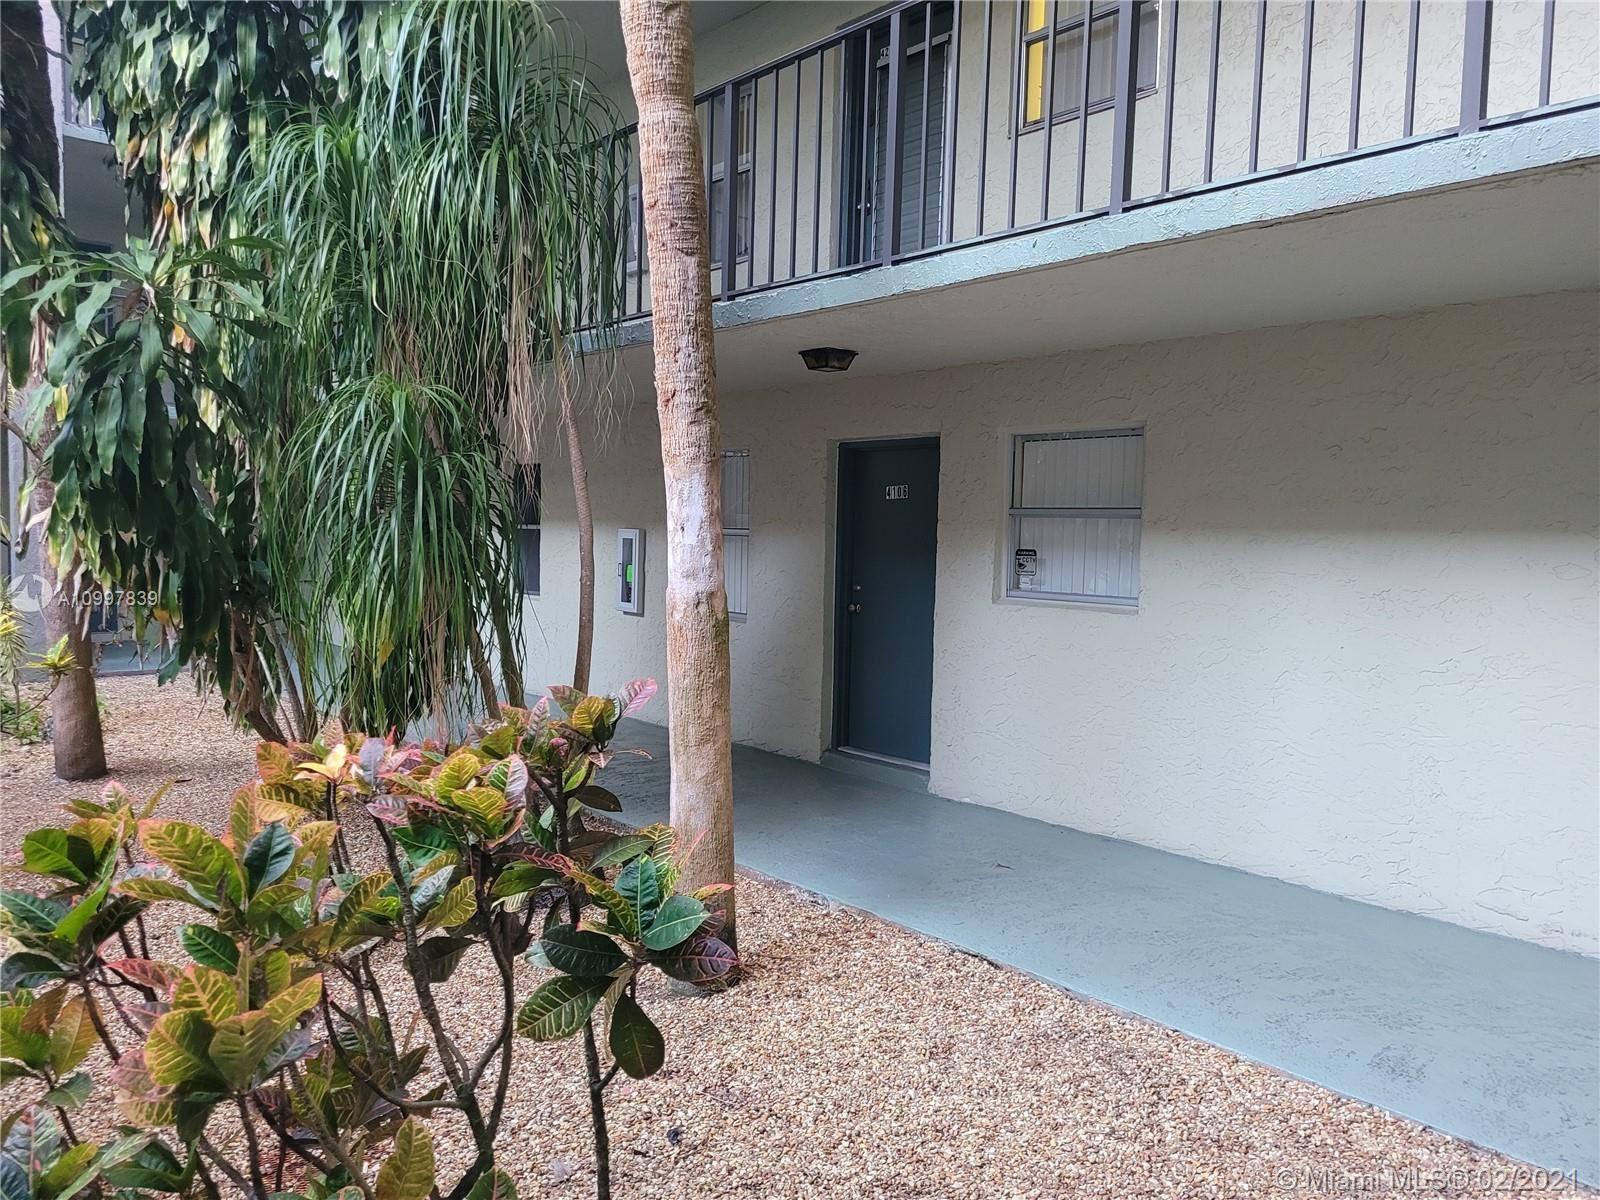 1830 N Lauderdale Ave #4106, North Lauderdale, FL 33068 - #: A10997839